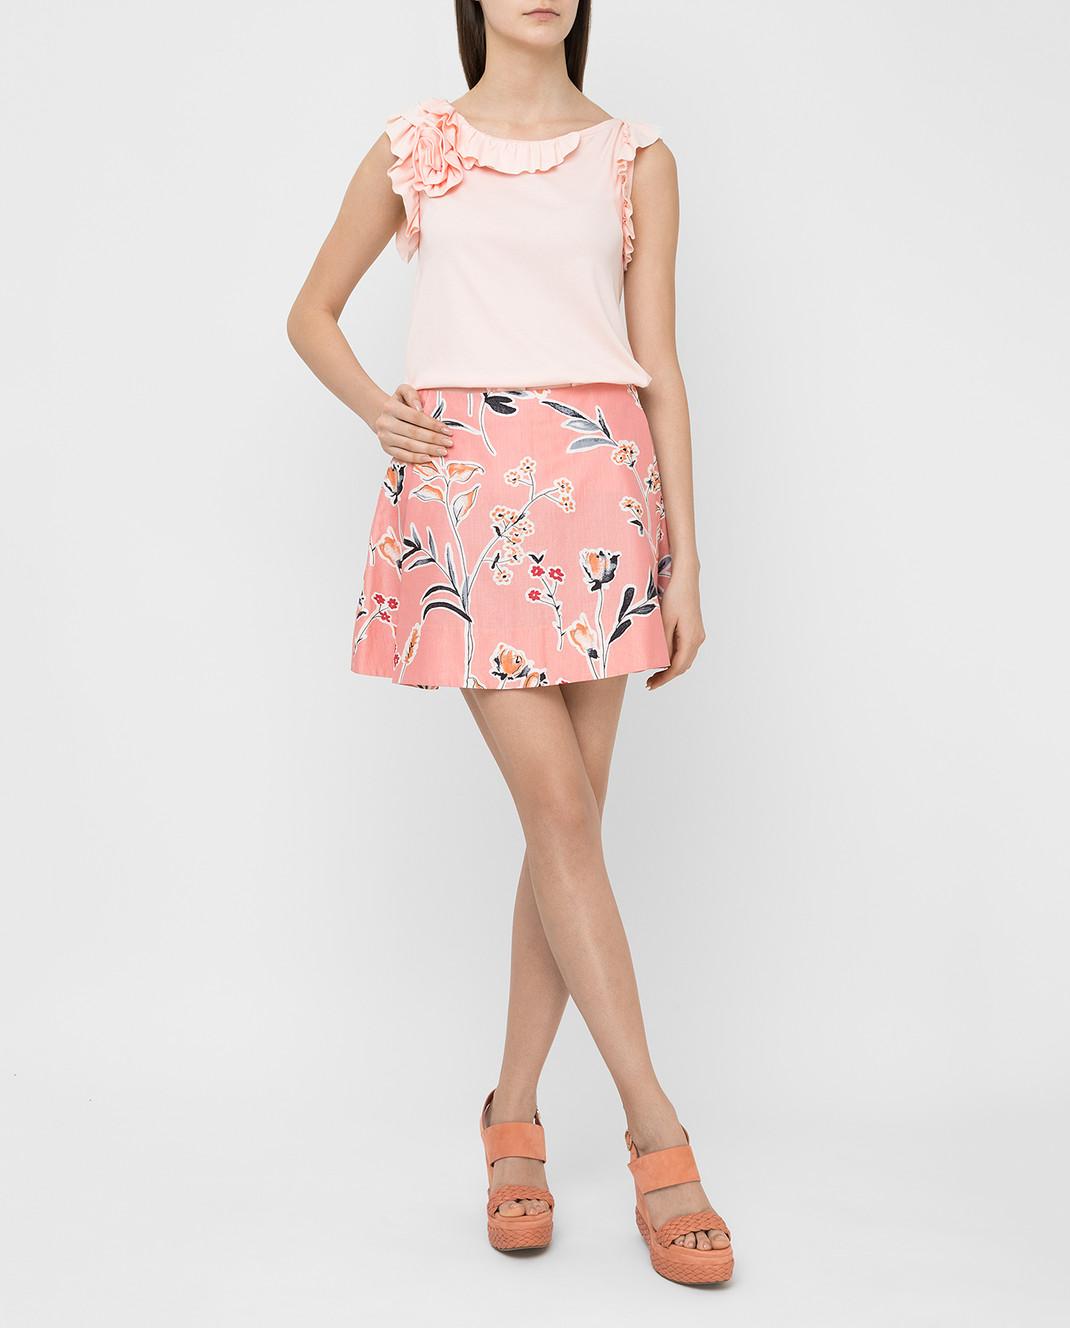 Marni Розовая юбка GOMAR35A00TCR58 изображение 2